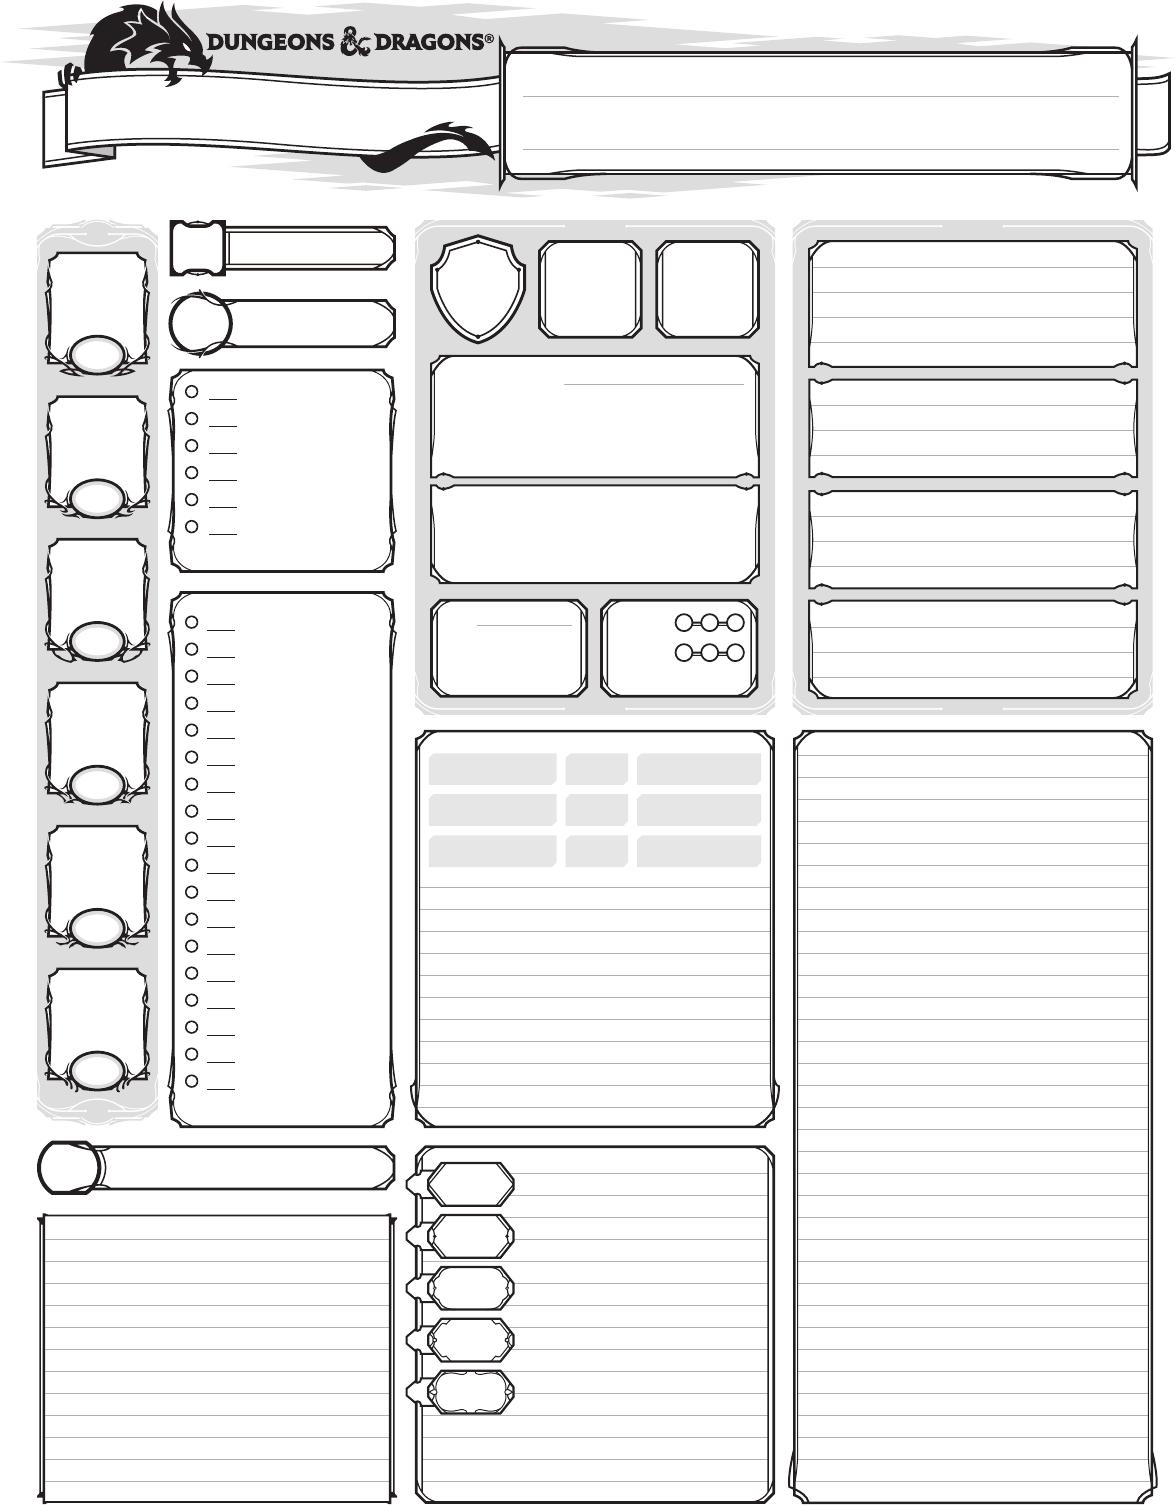 Dnd 5e Character Sheet Printable Free